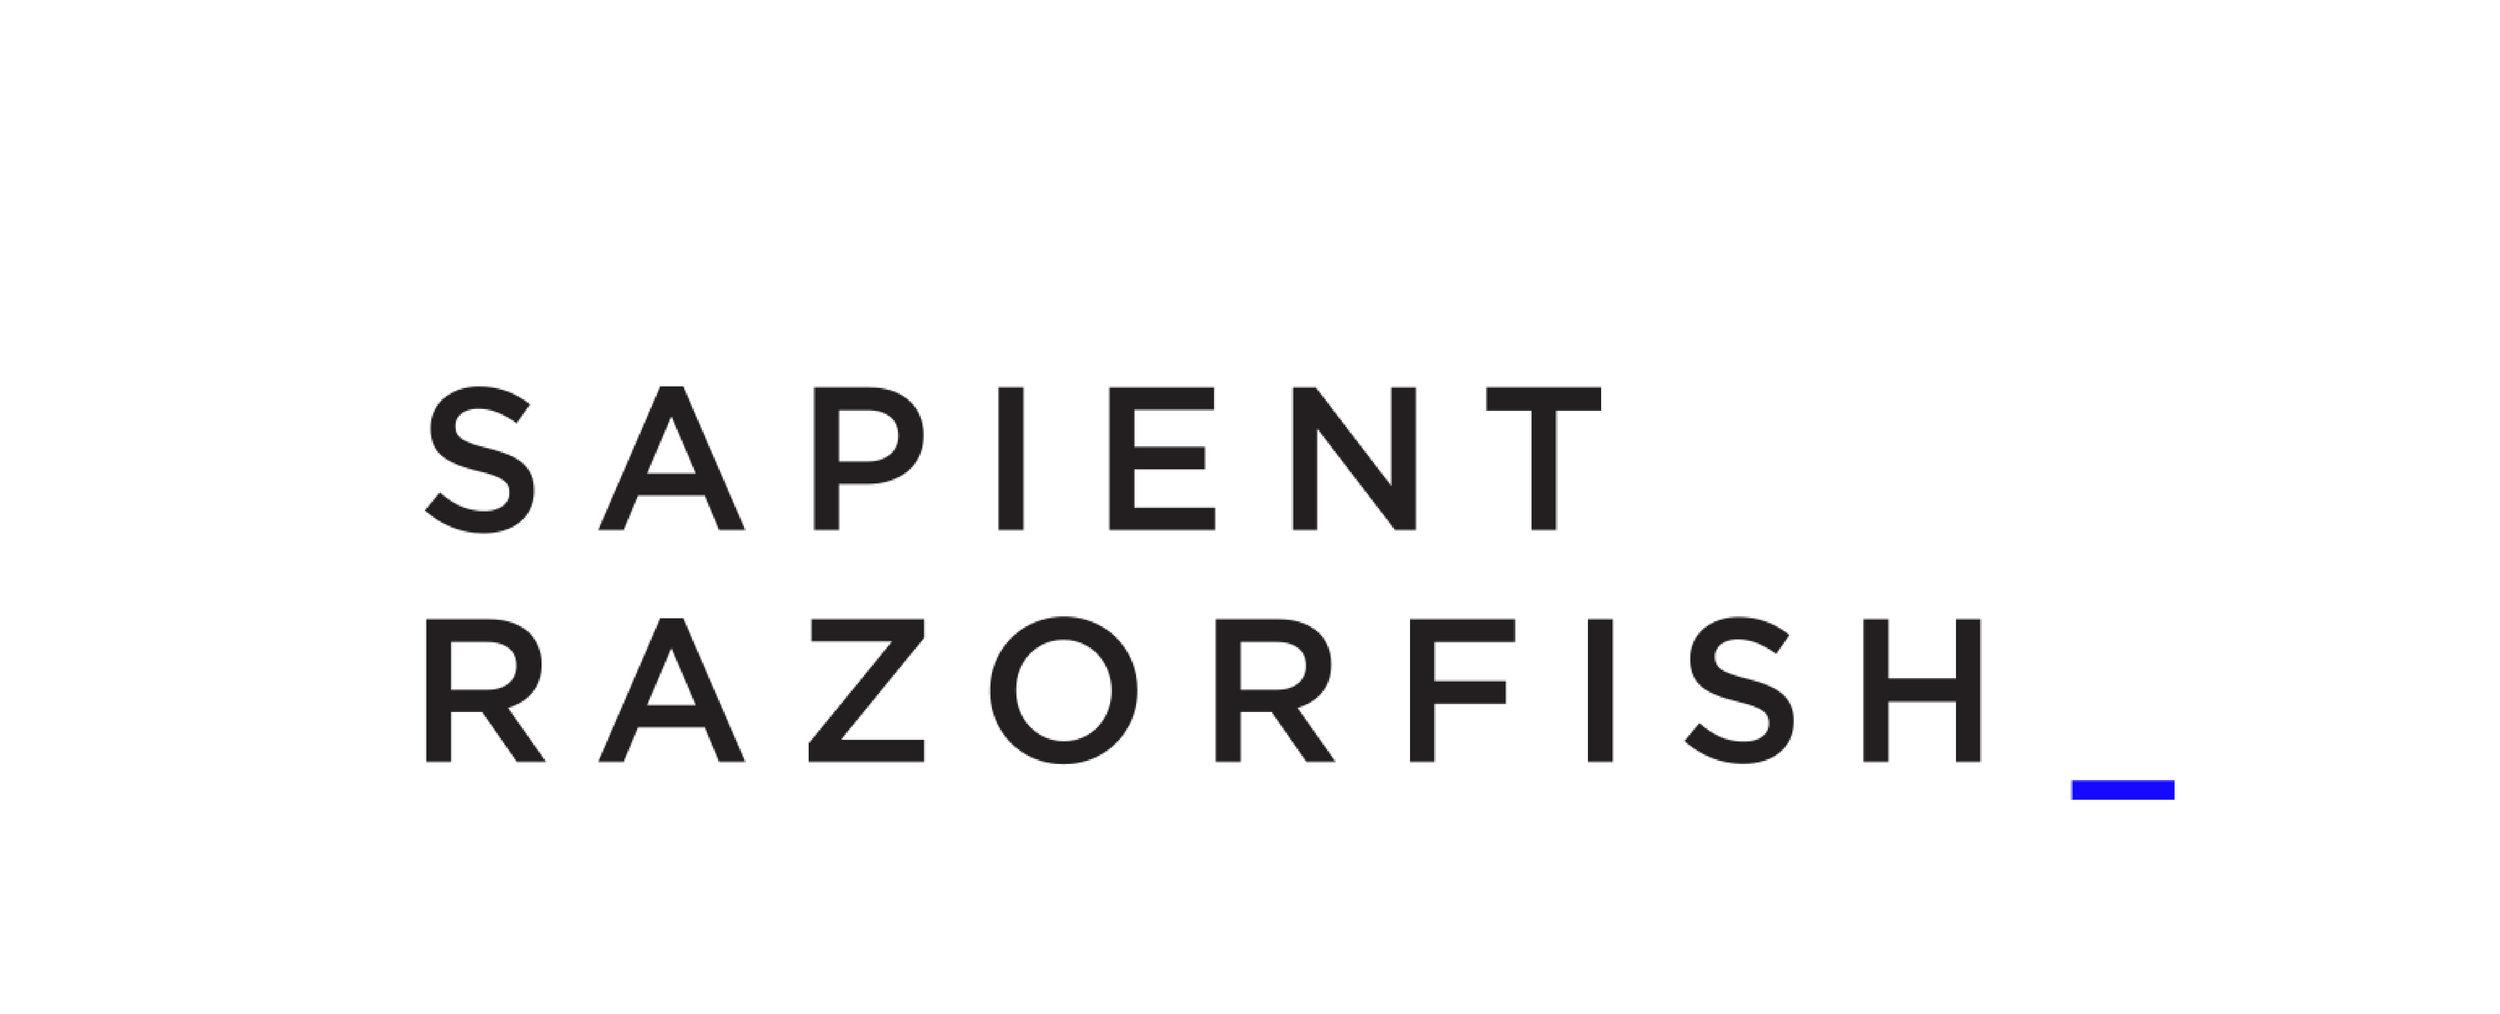 Sapient Razorfish